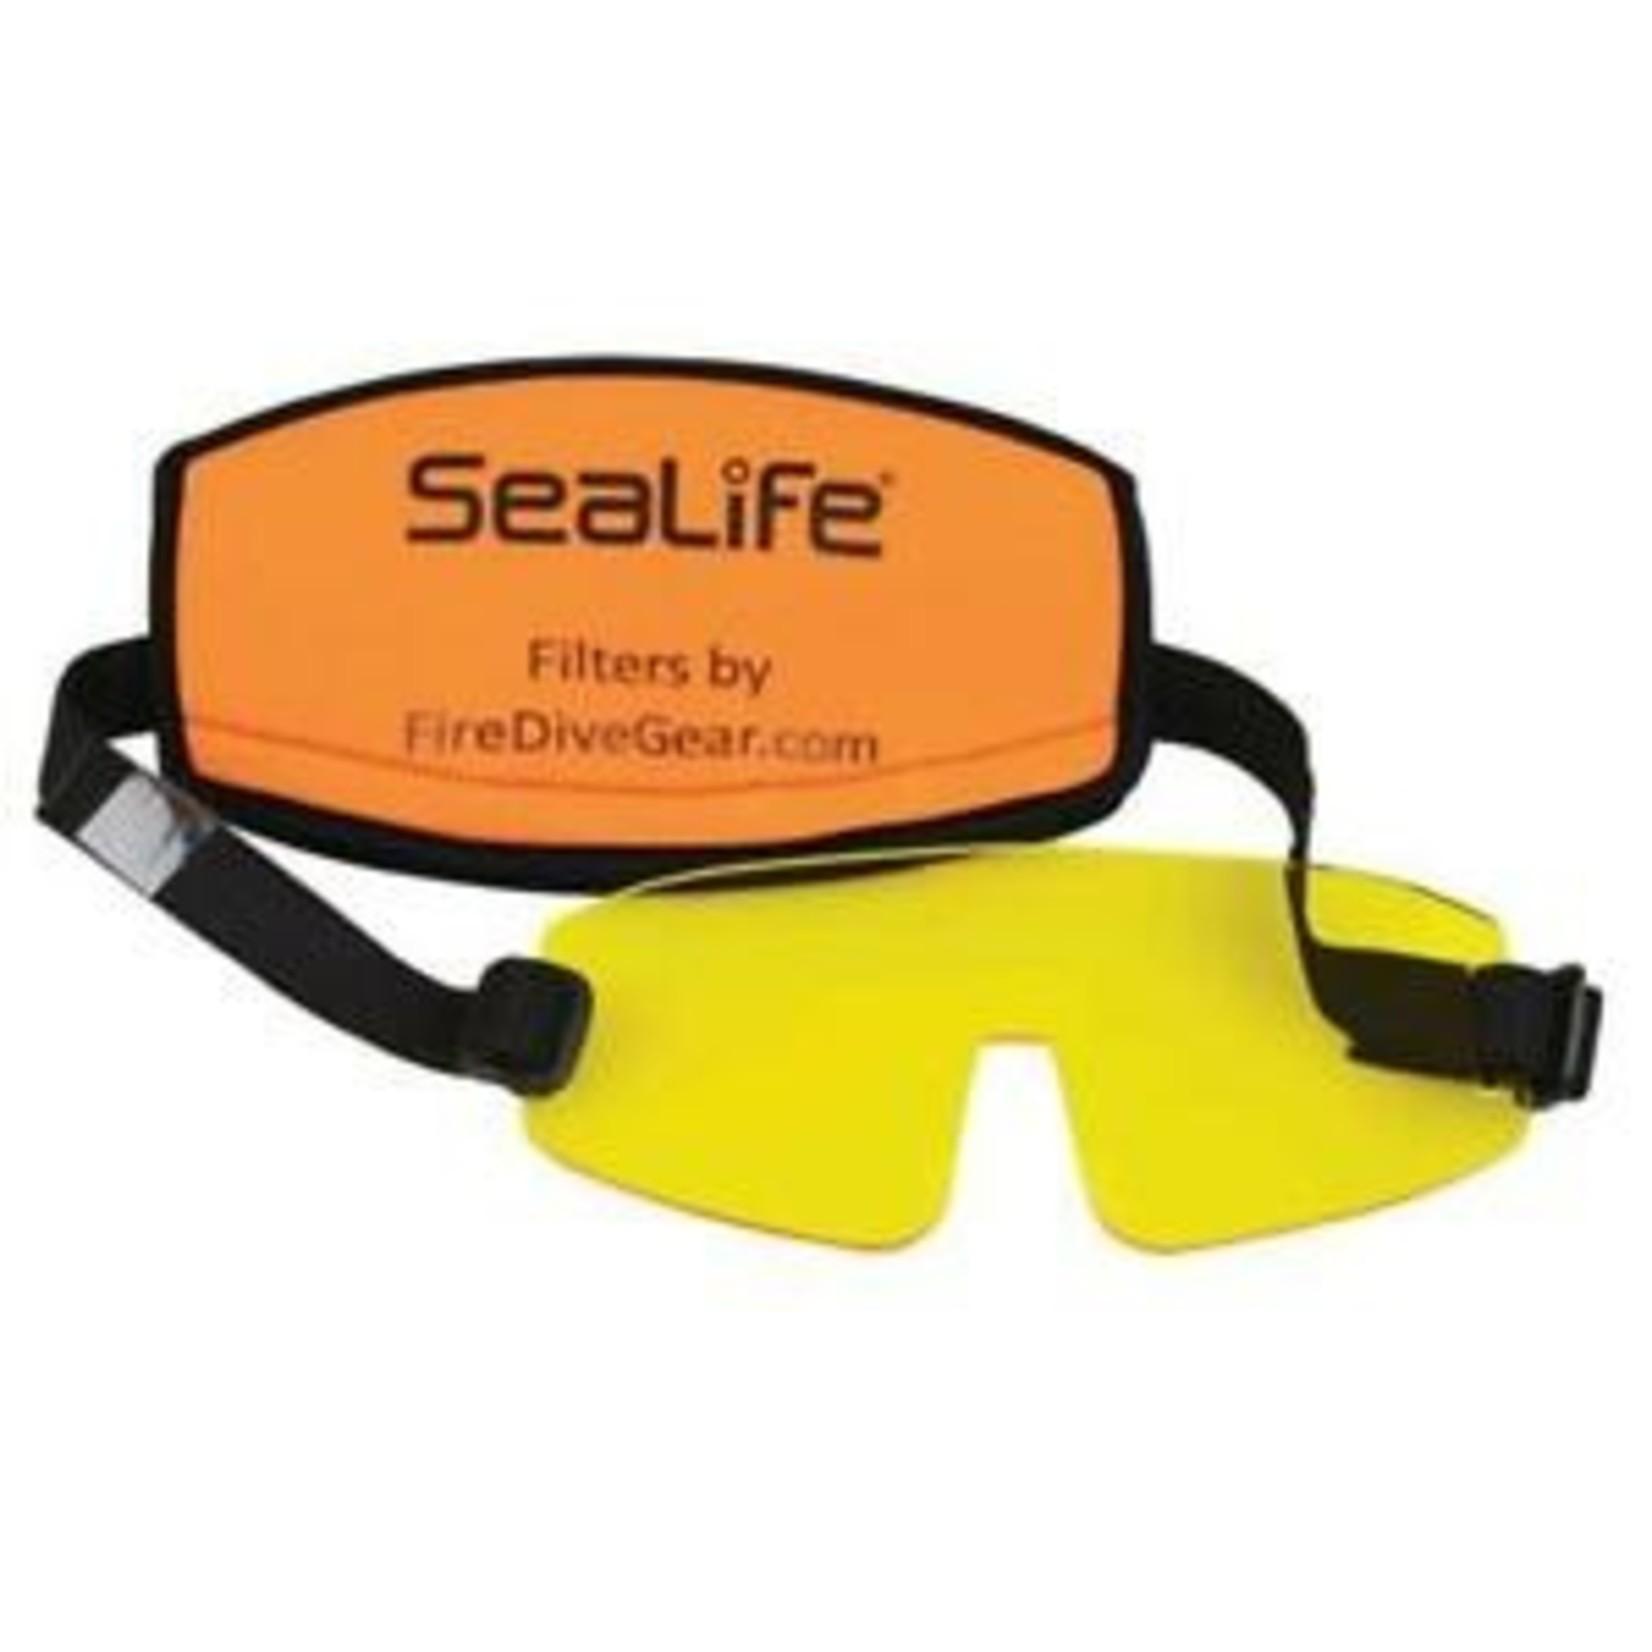 Sealife Sea Dragon Mini Fluoro Light & Mask Filter (batteries not included)